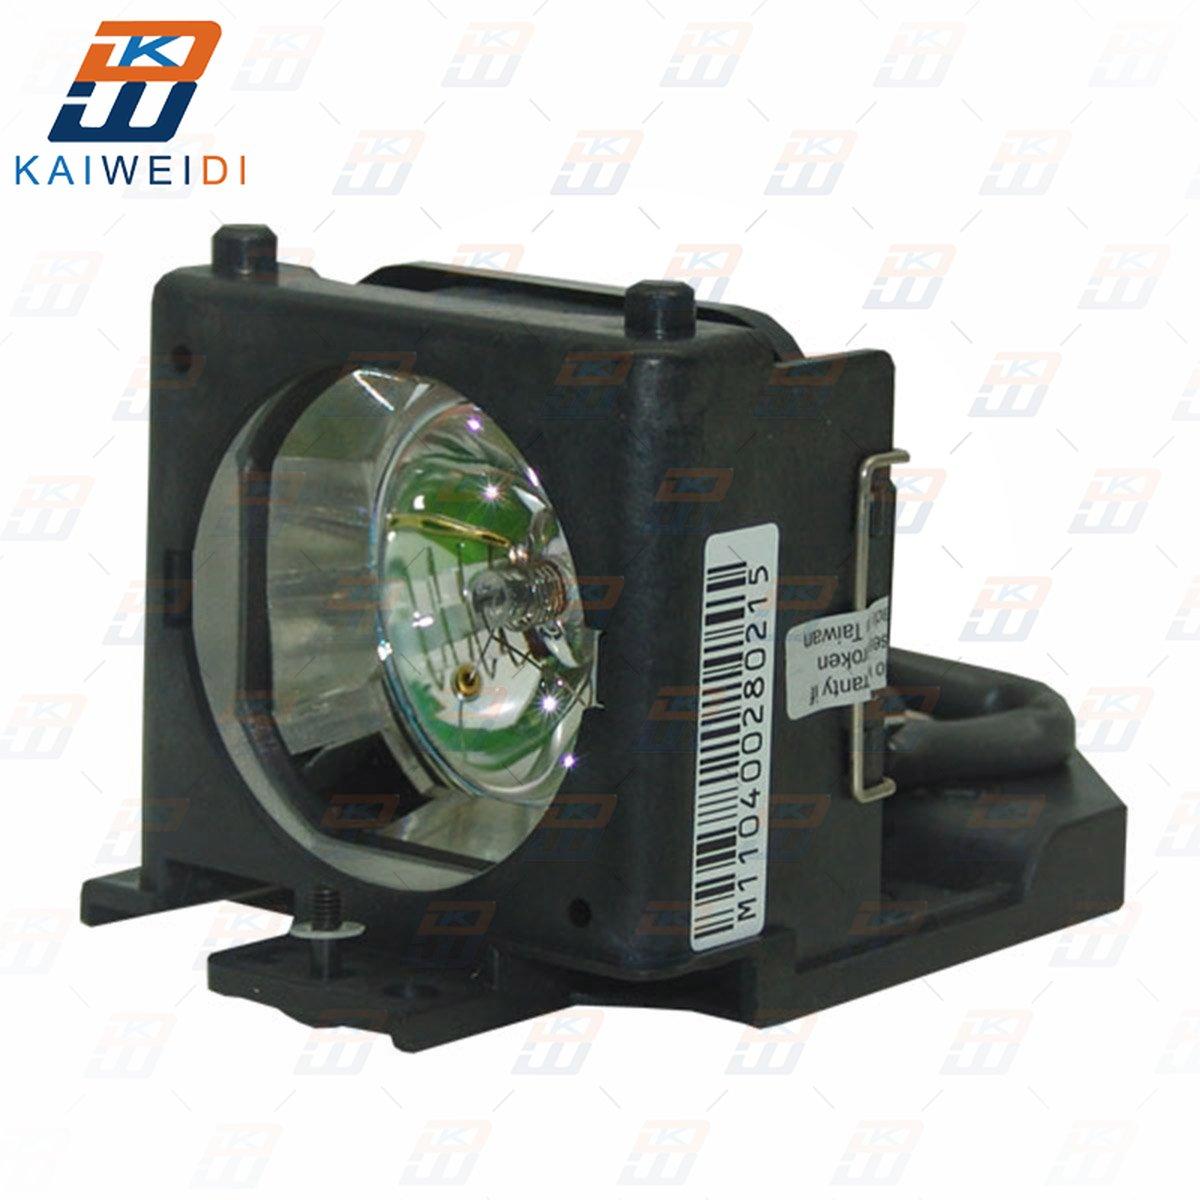 DT00701 For Hitachi CP-HS980 CP-HX990 CP-RS55 CP-RS56 CP-RS56+ CP-RS57 CP-RX60 CP-RX60Z RX61 RX61+ ED-PJ32 PJ-LC7 PJ-LC9 PJ-LC9W